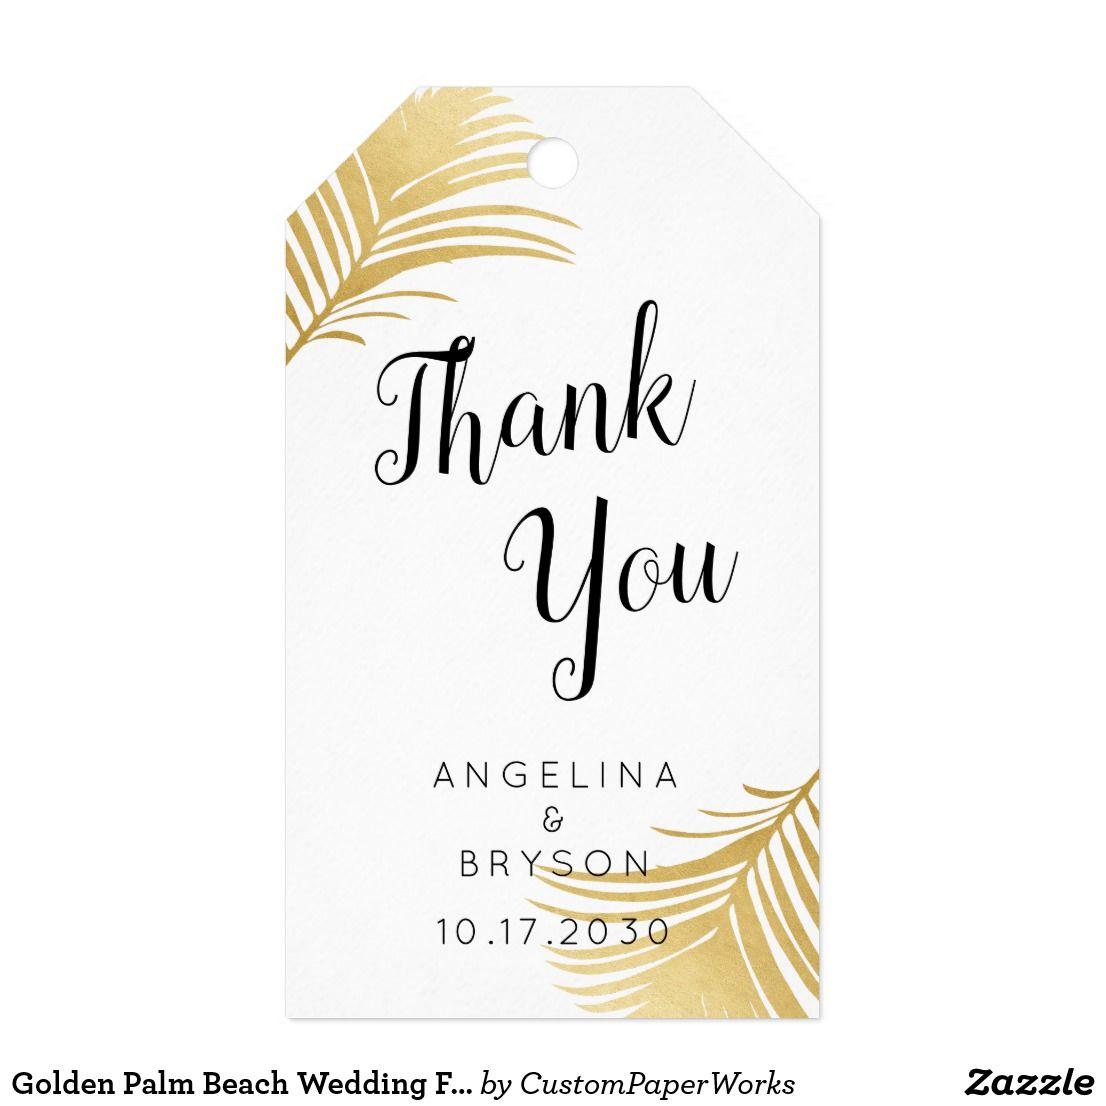 Golden Palm Beach Wedding Favor Tags | Boarding pass invitation ...